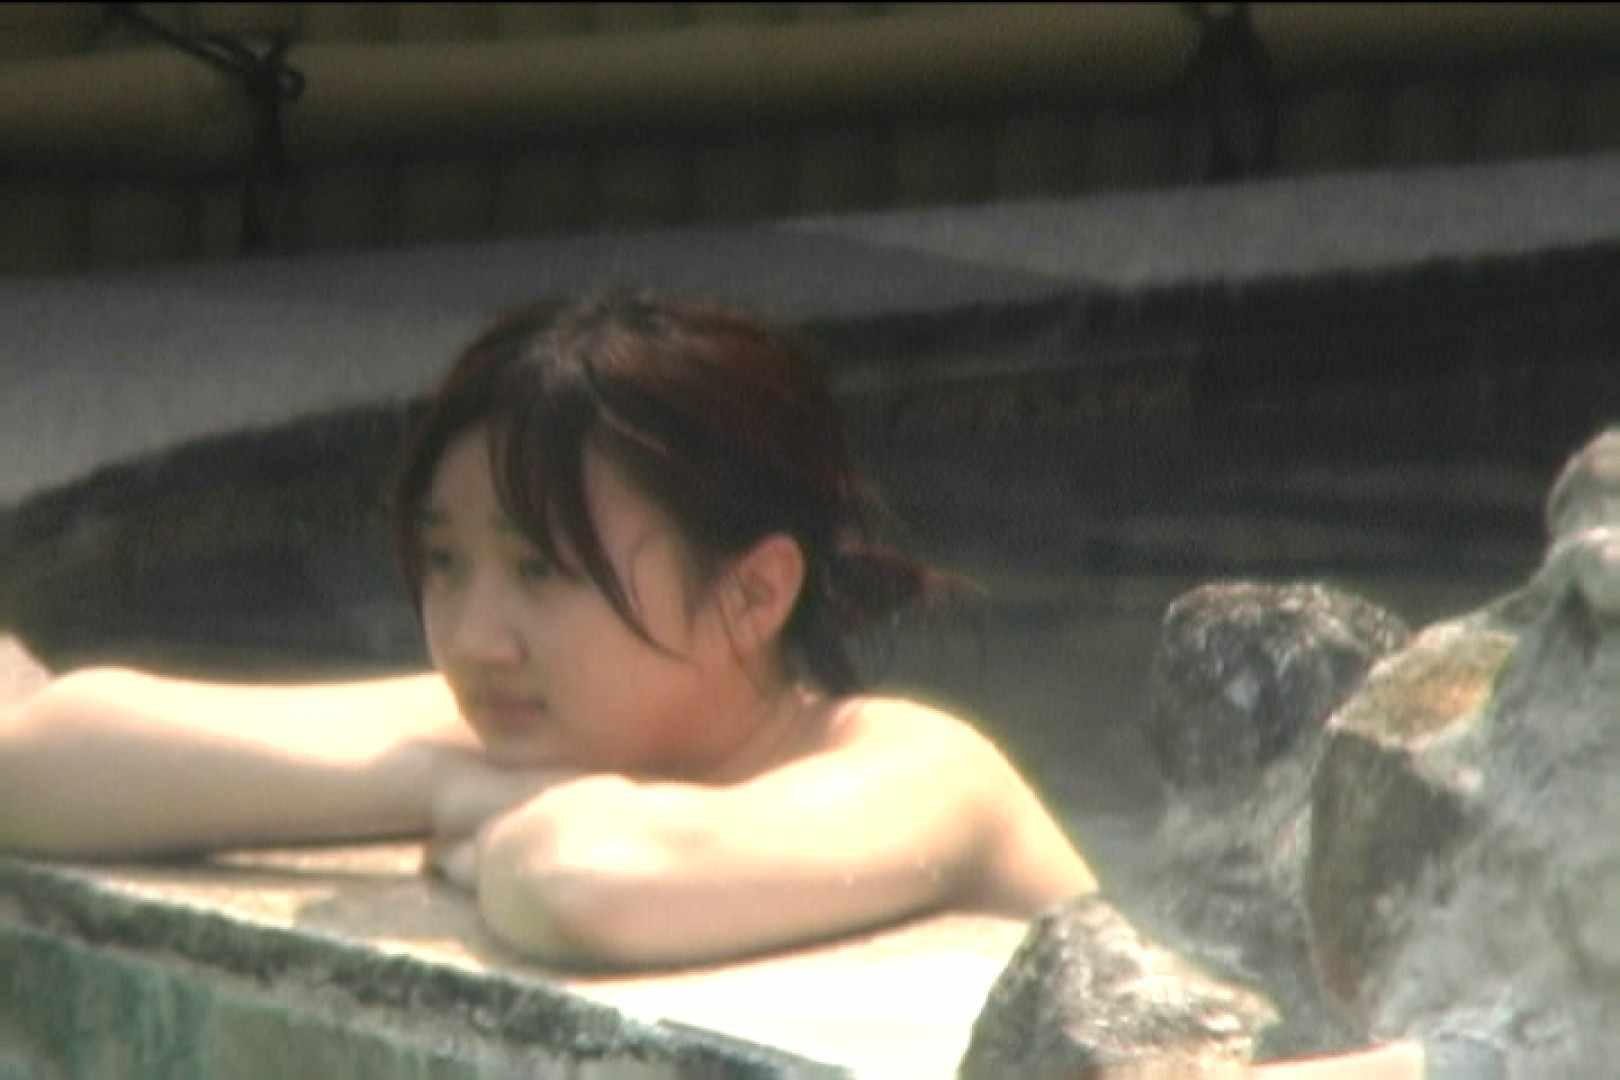 Aquaな露天風呂Vol.140 0   0  55連発 1